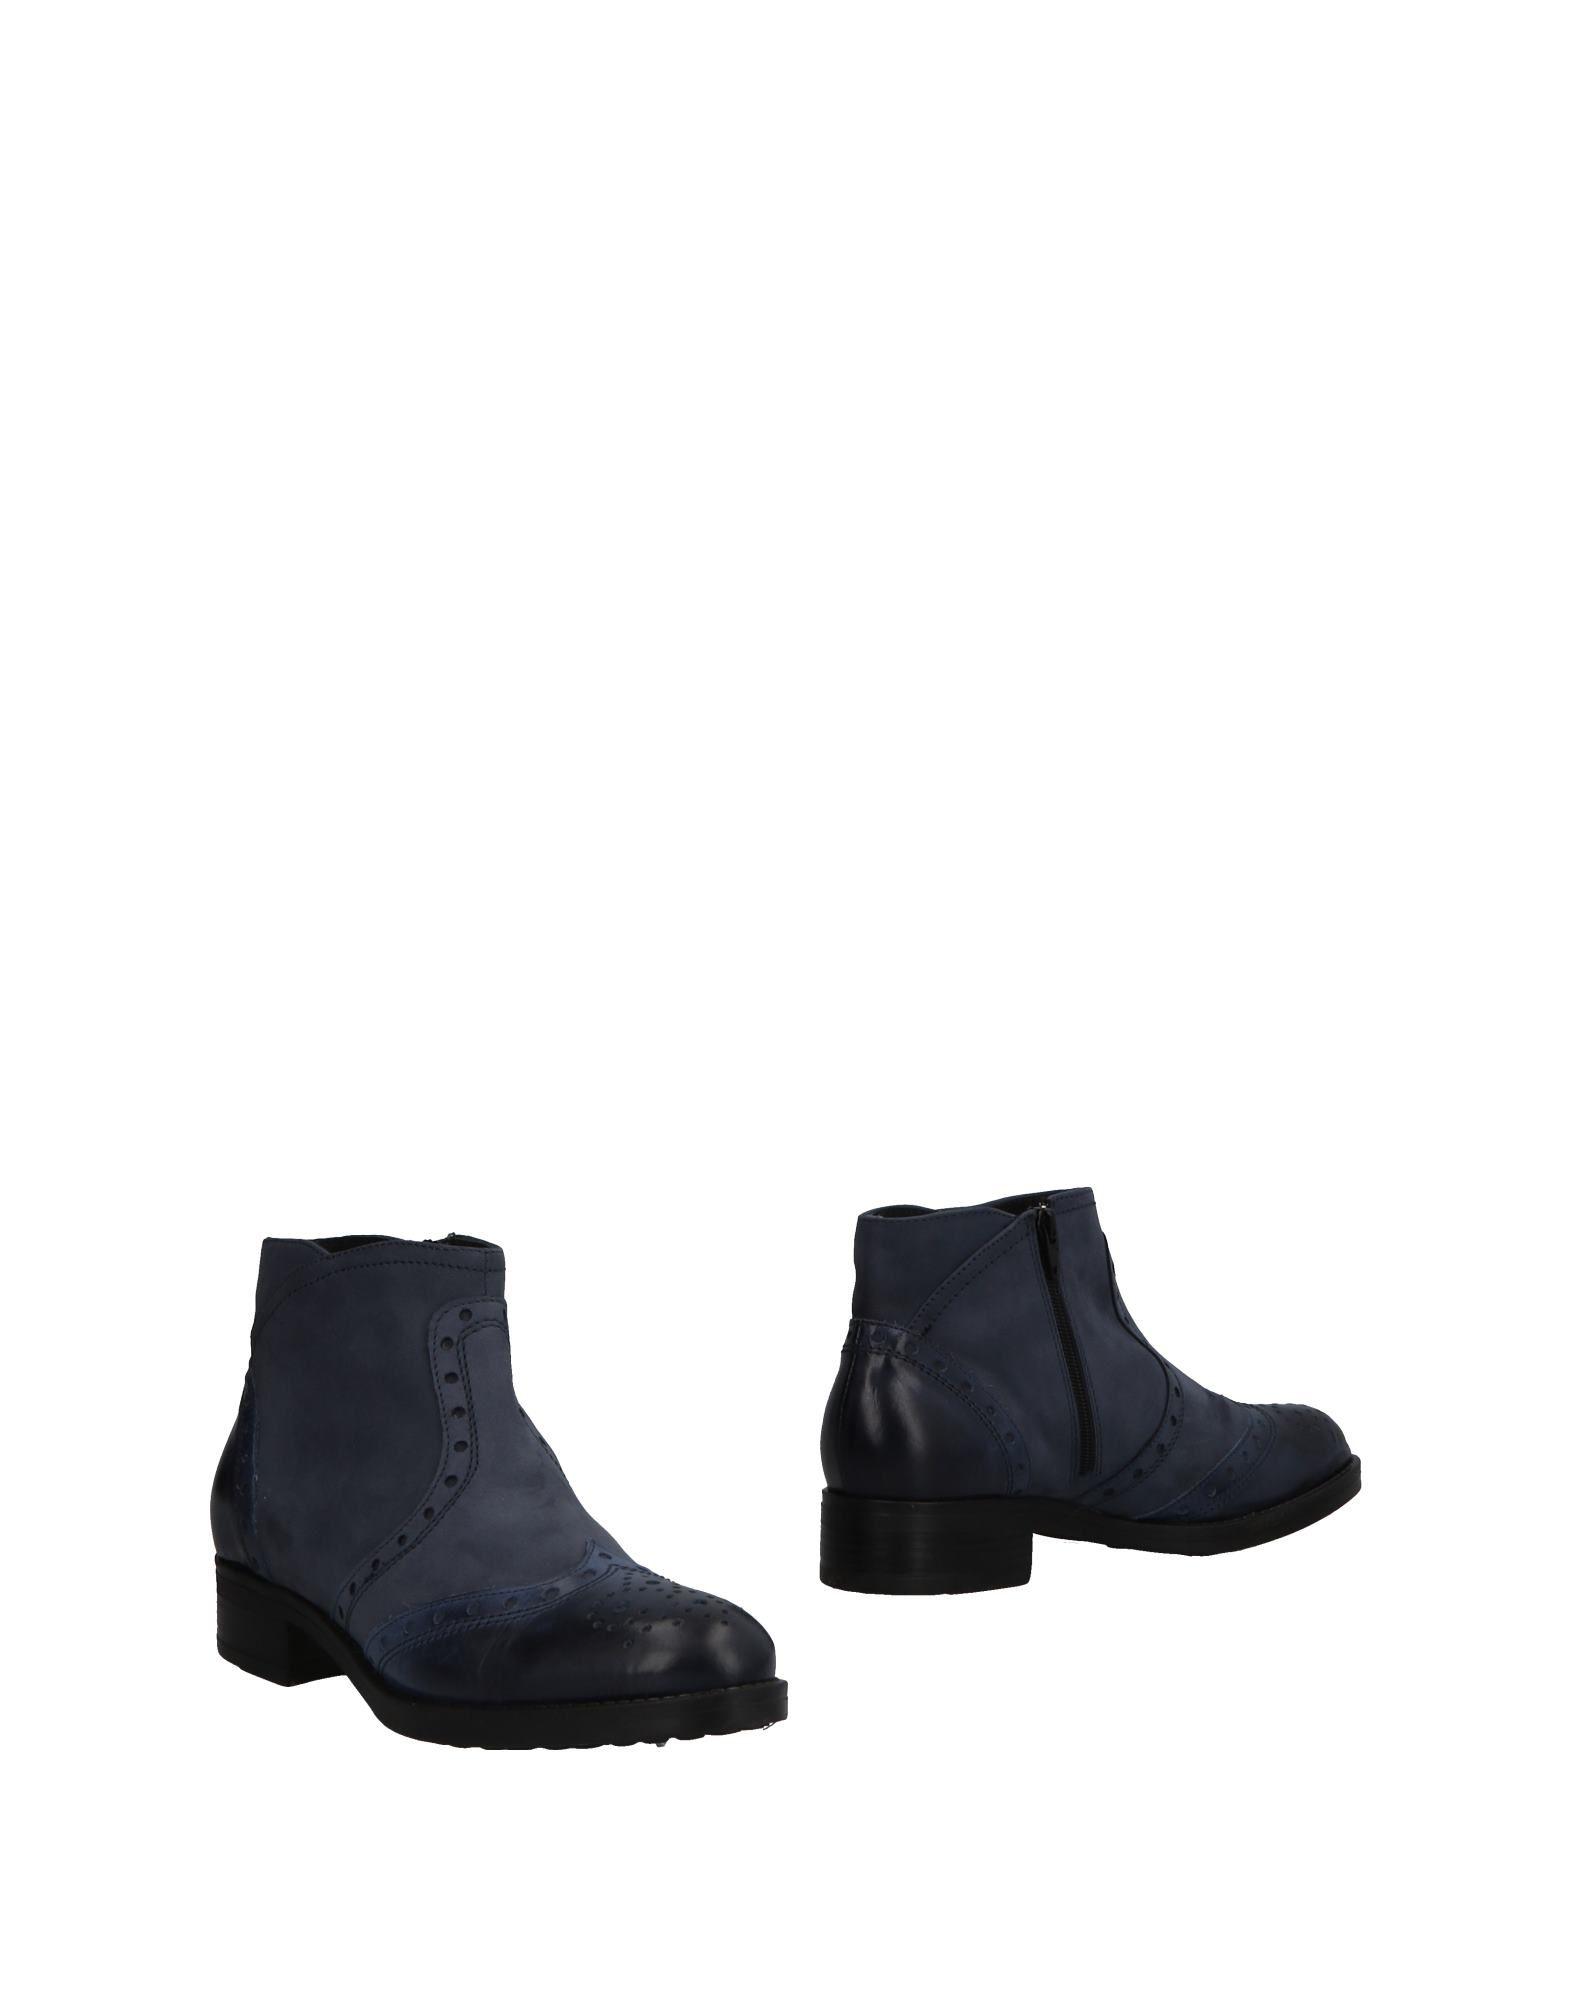 Donna Più  Stiefelette Damen  Più 11504652VV Gute Qualität beliebte Schuhe bd51bb